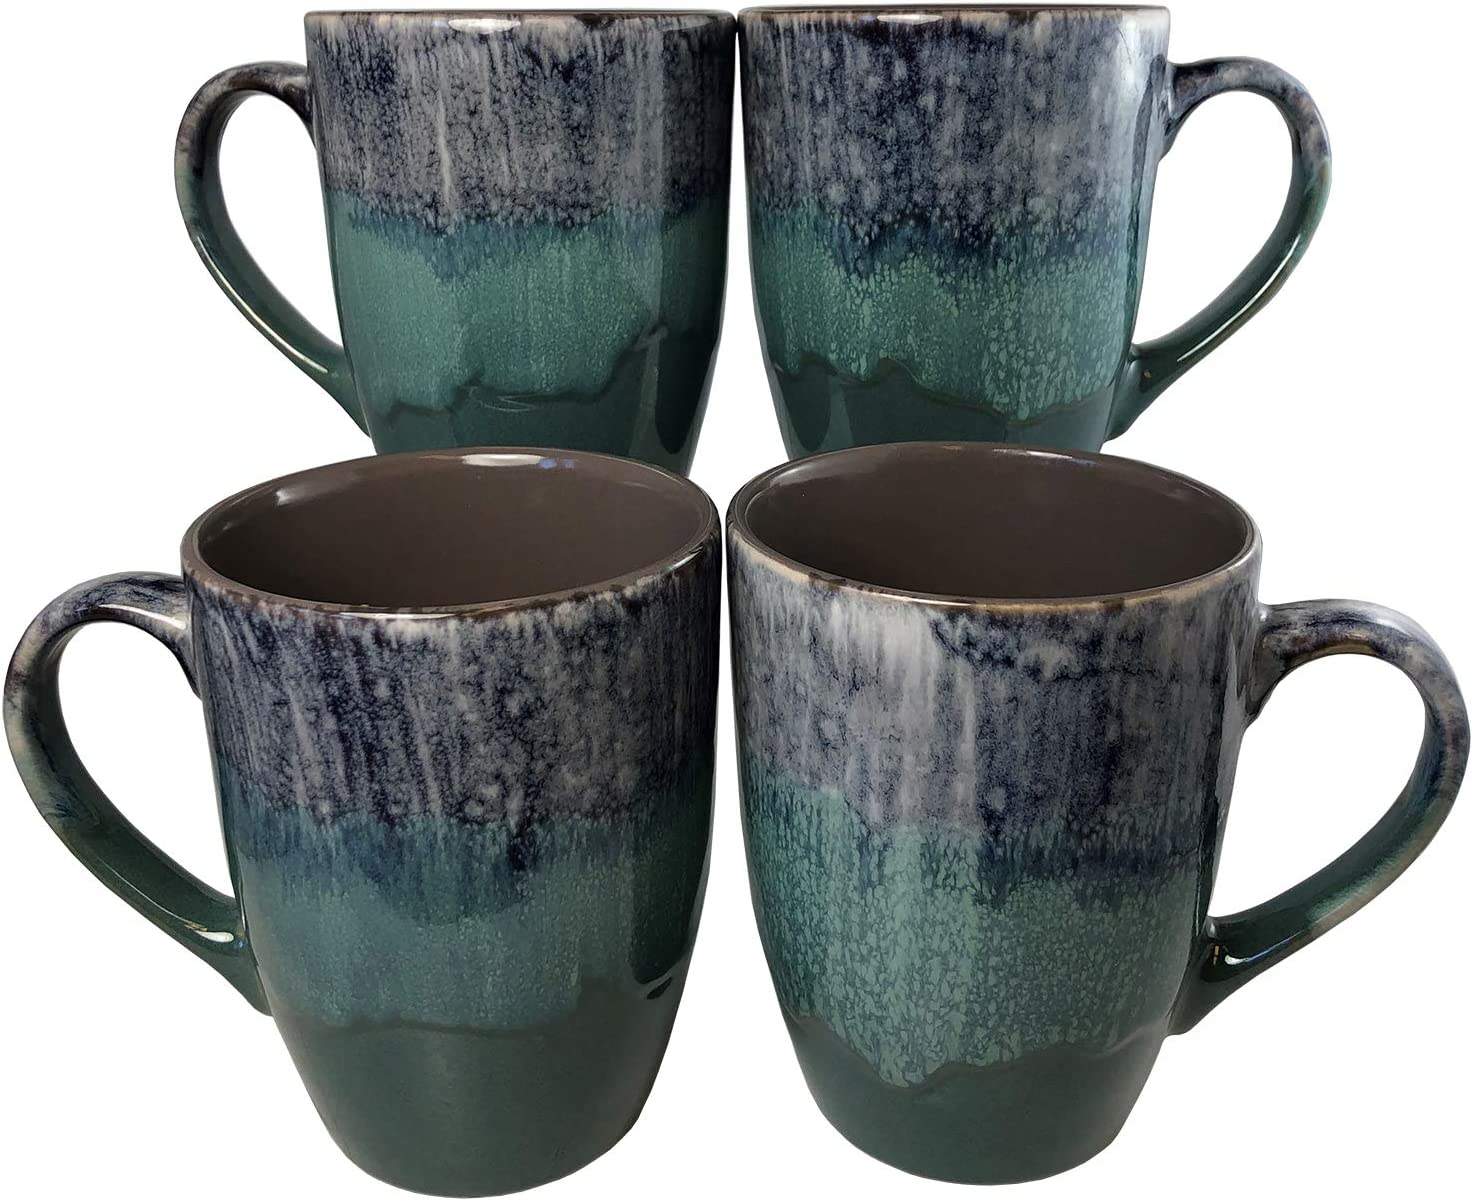 Reactive Glaze Coffee Mugs | Set of 4 (Green) | 16oz Ceramic Tapered Mugs | Microwave & Dishwasher Safe